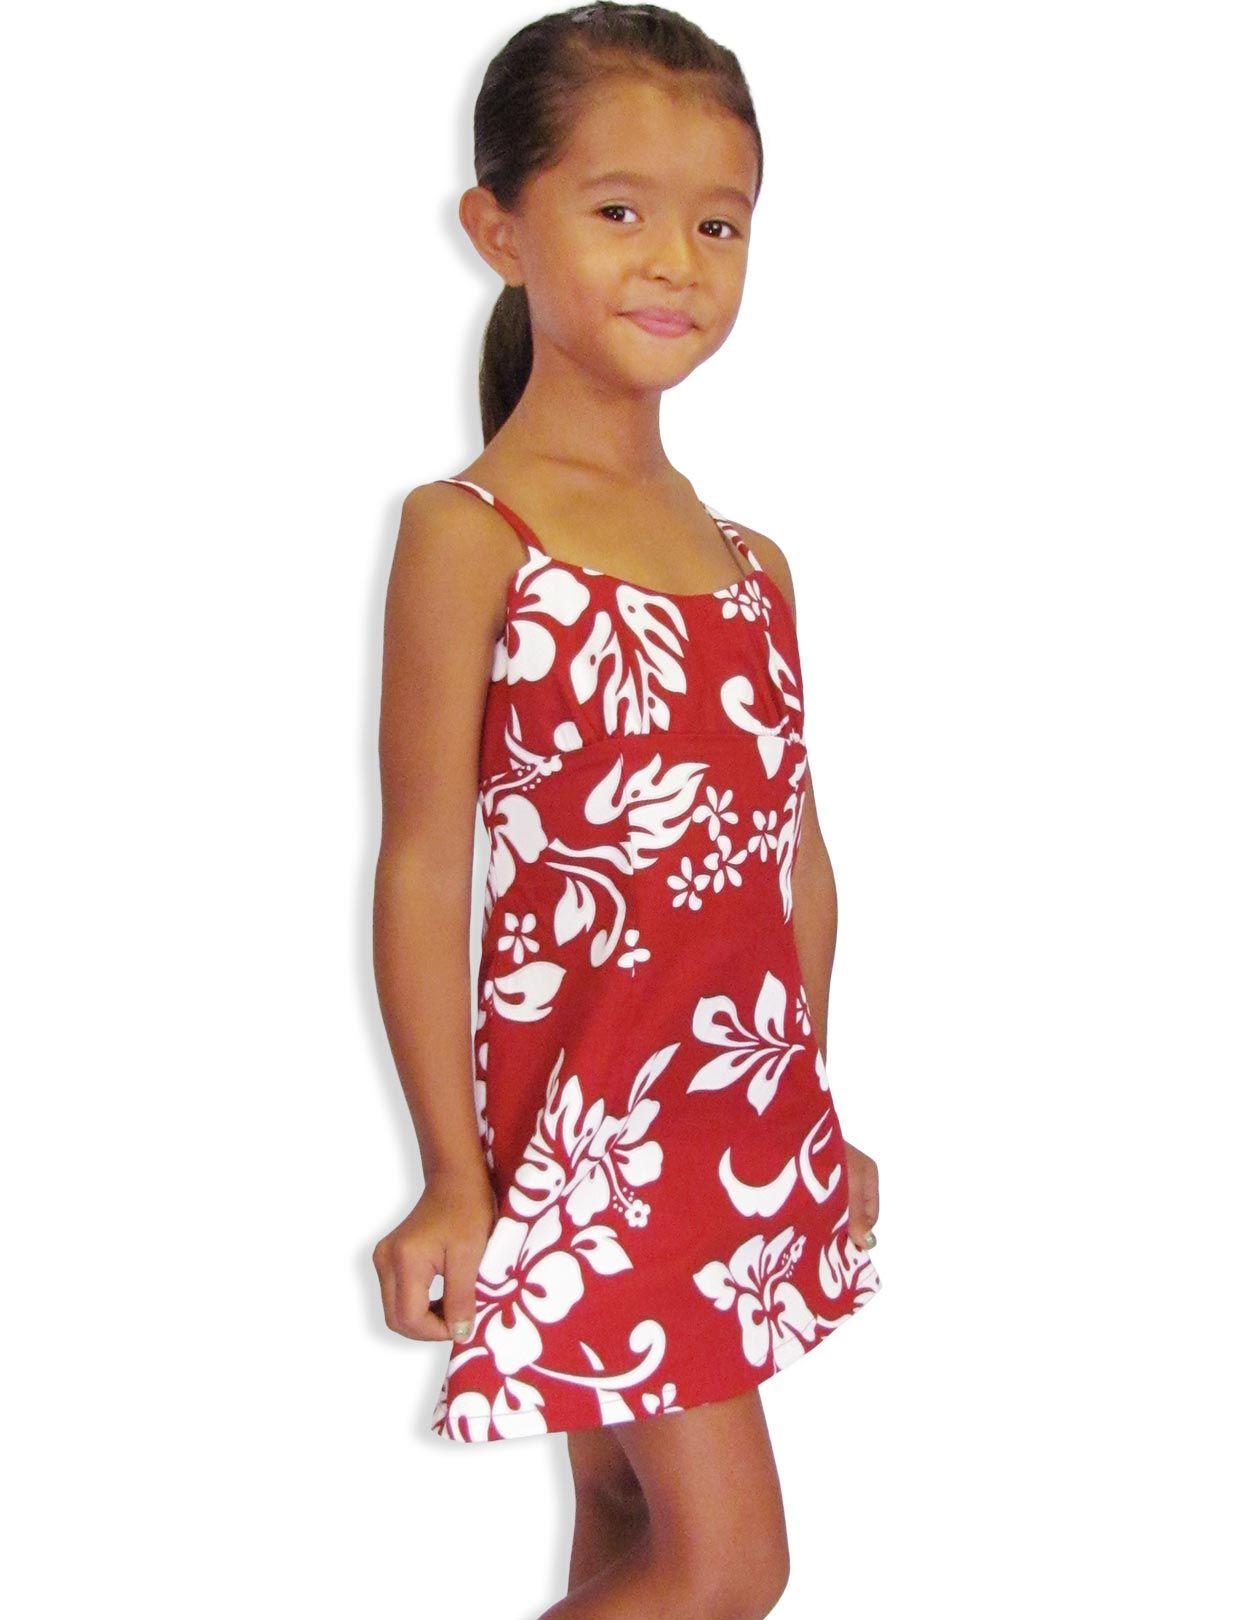 Flower dress for girl hibiscus hawaiian wedding place store flower dress for girl hibiscus hawaiian wedding place store girlsdresses izmirmasajfo